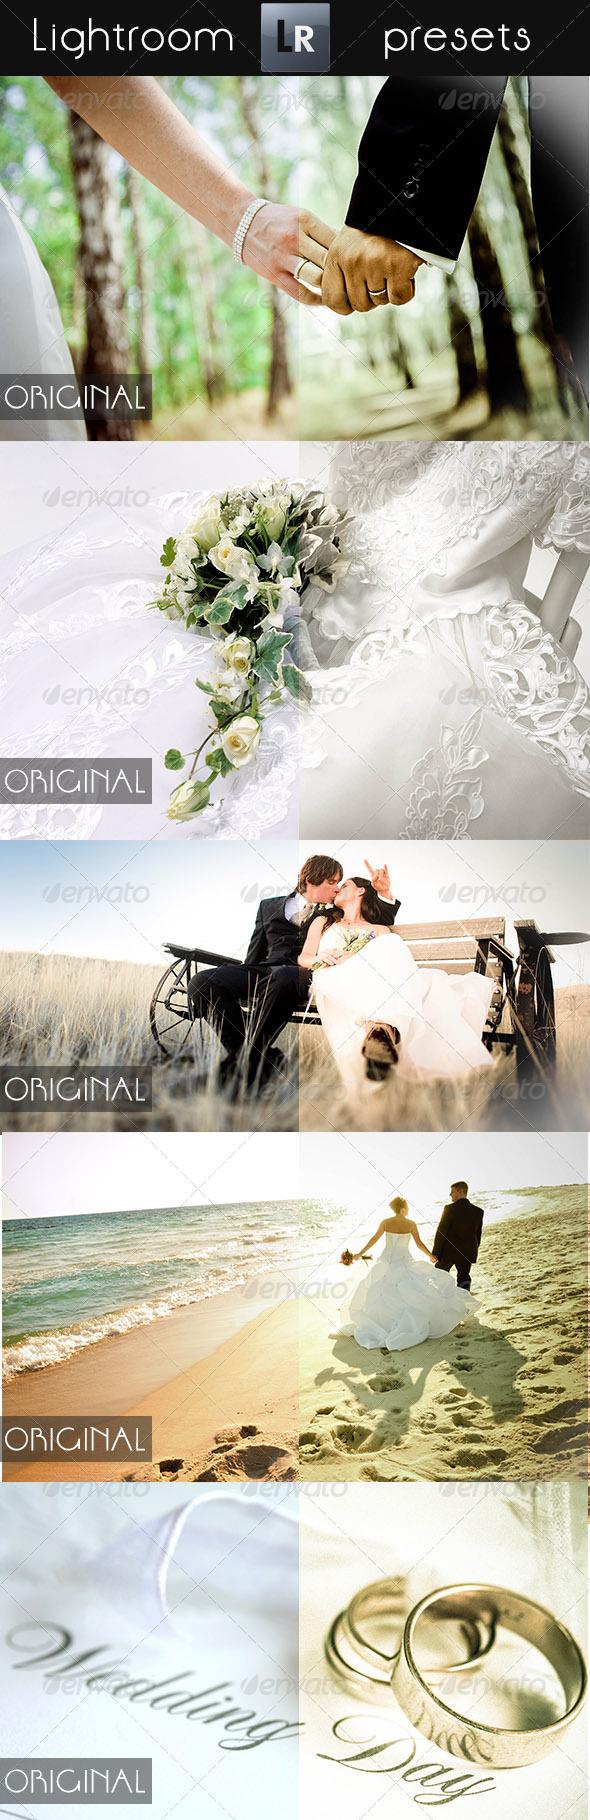 GraphicRiver 10 Wedding Pro Presets 5275378